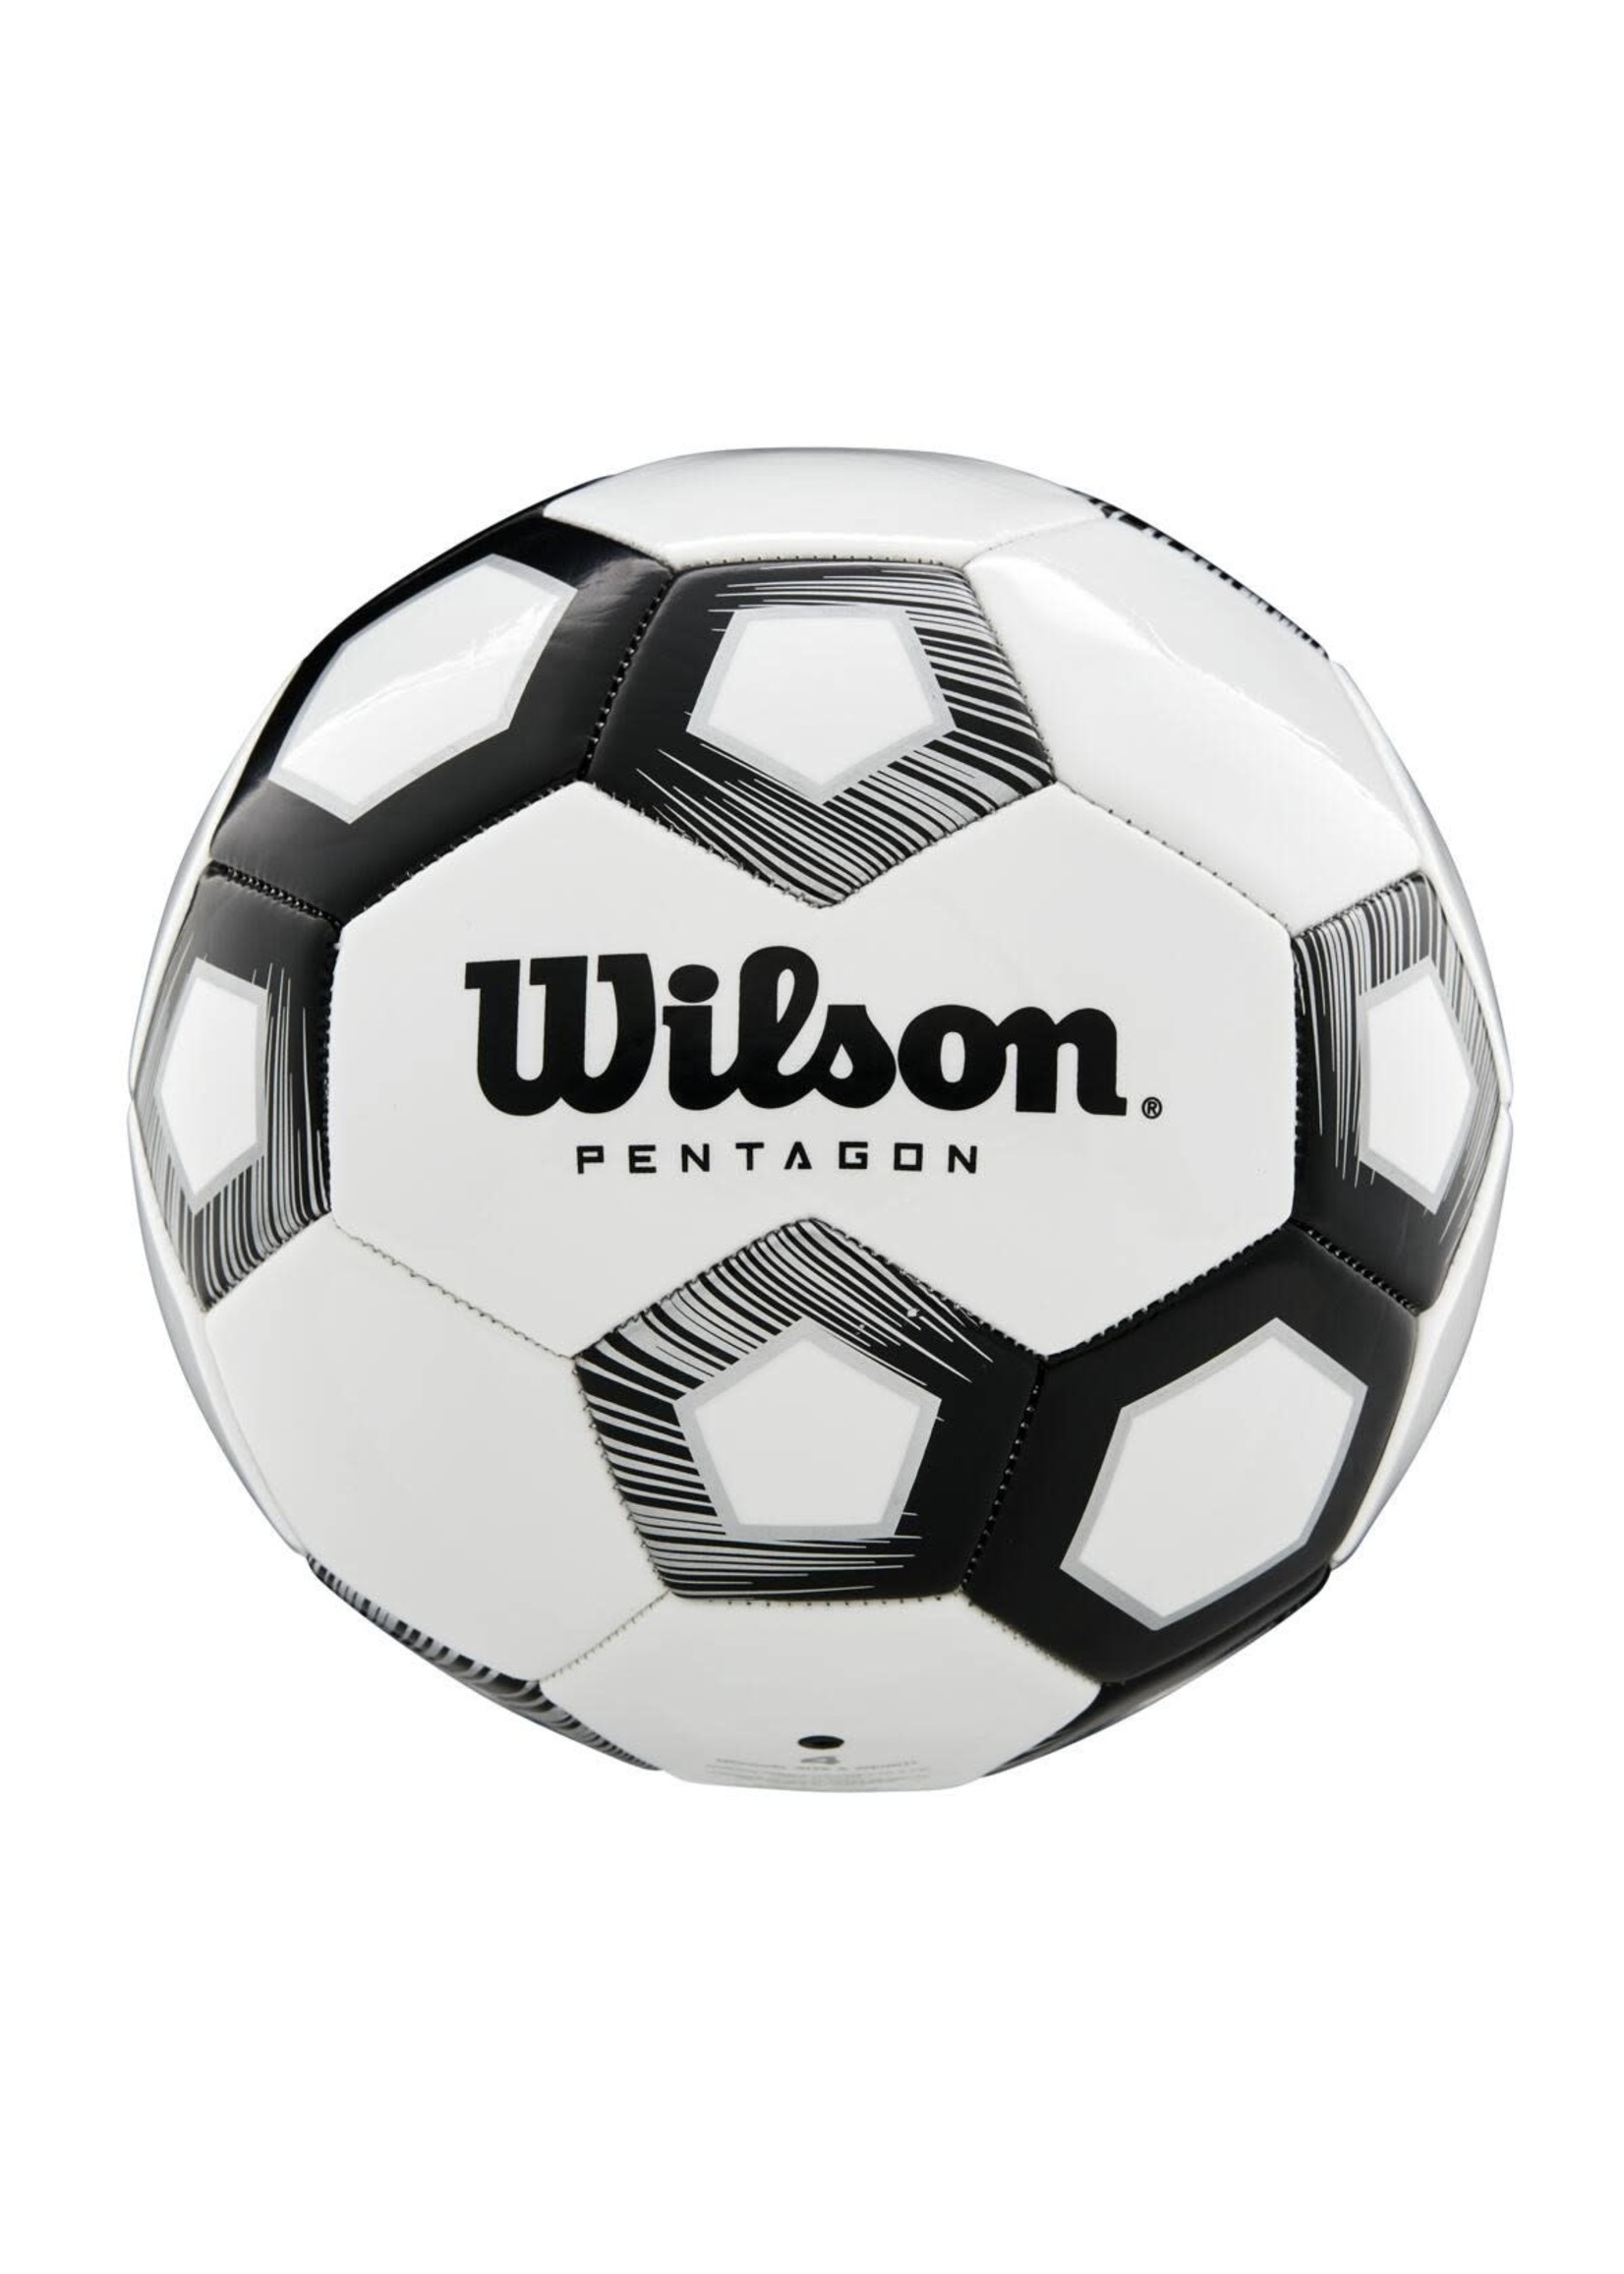 Wilson Wilson Pentagon Football (2020)